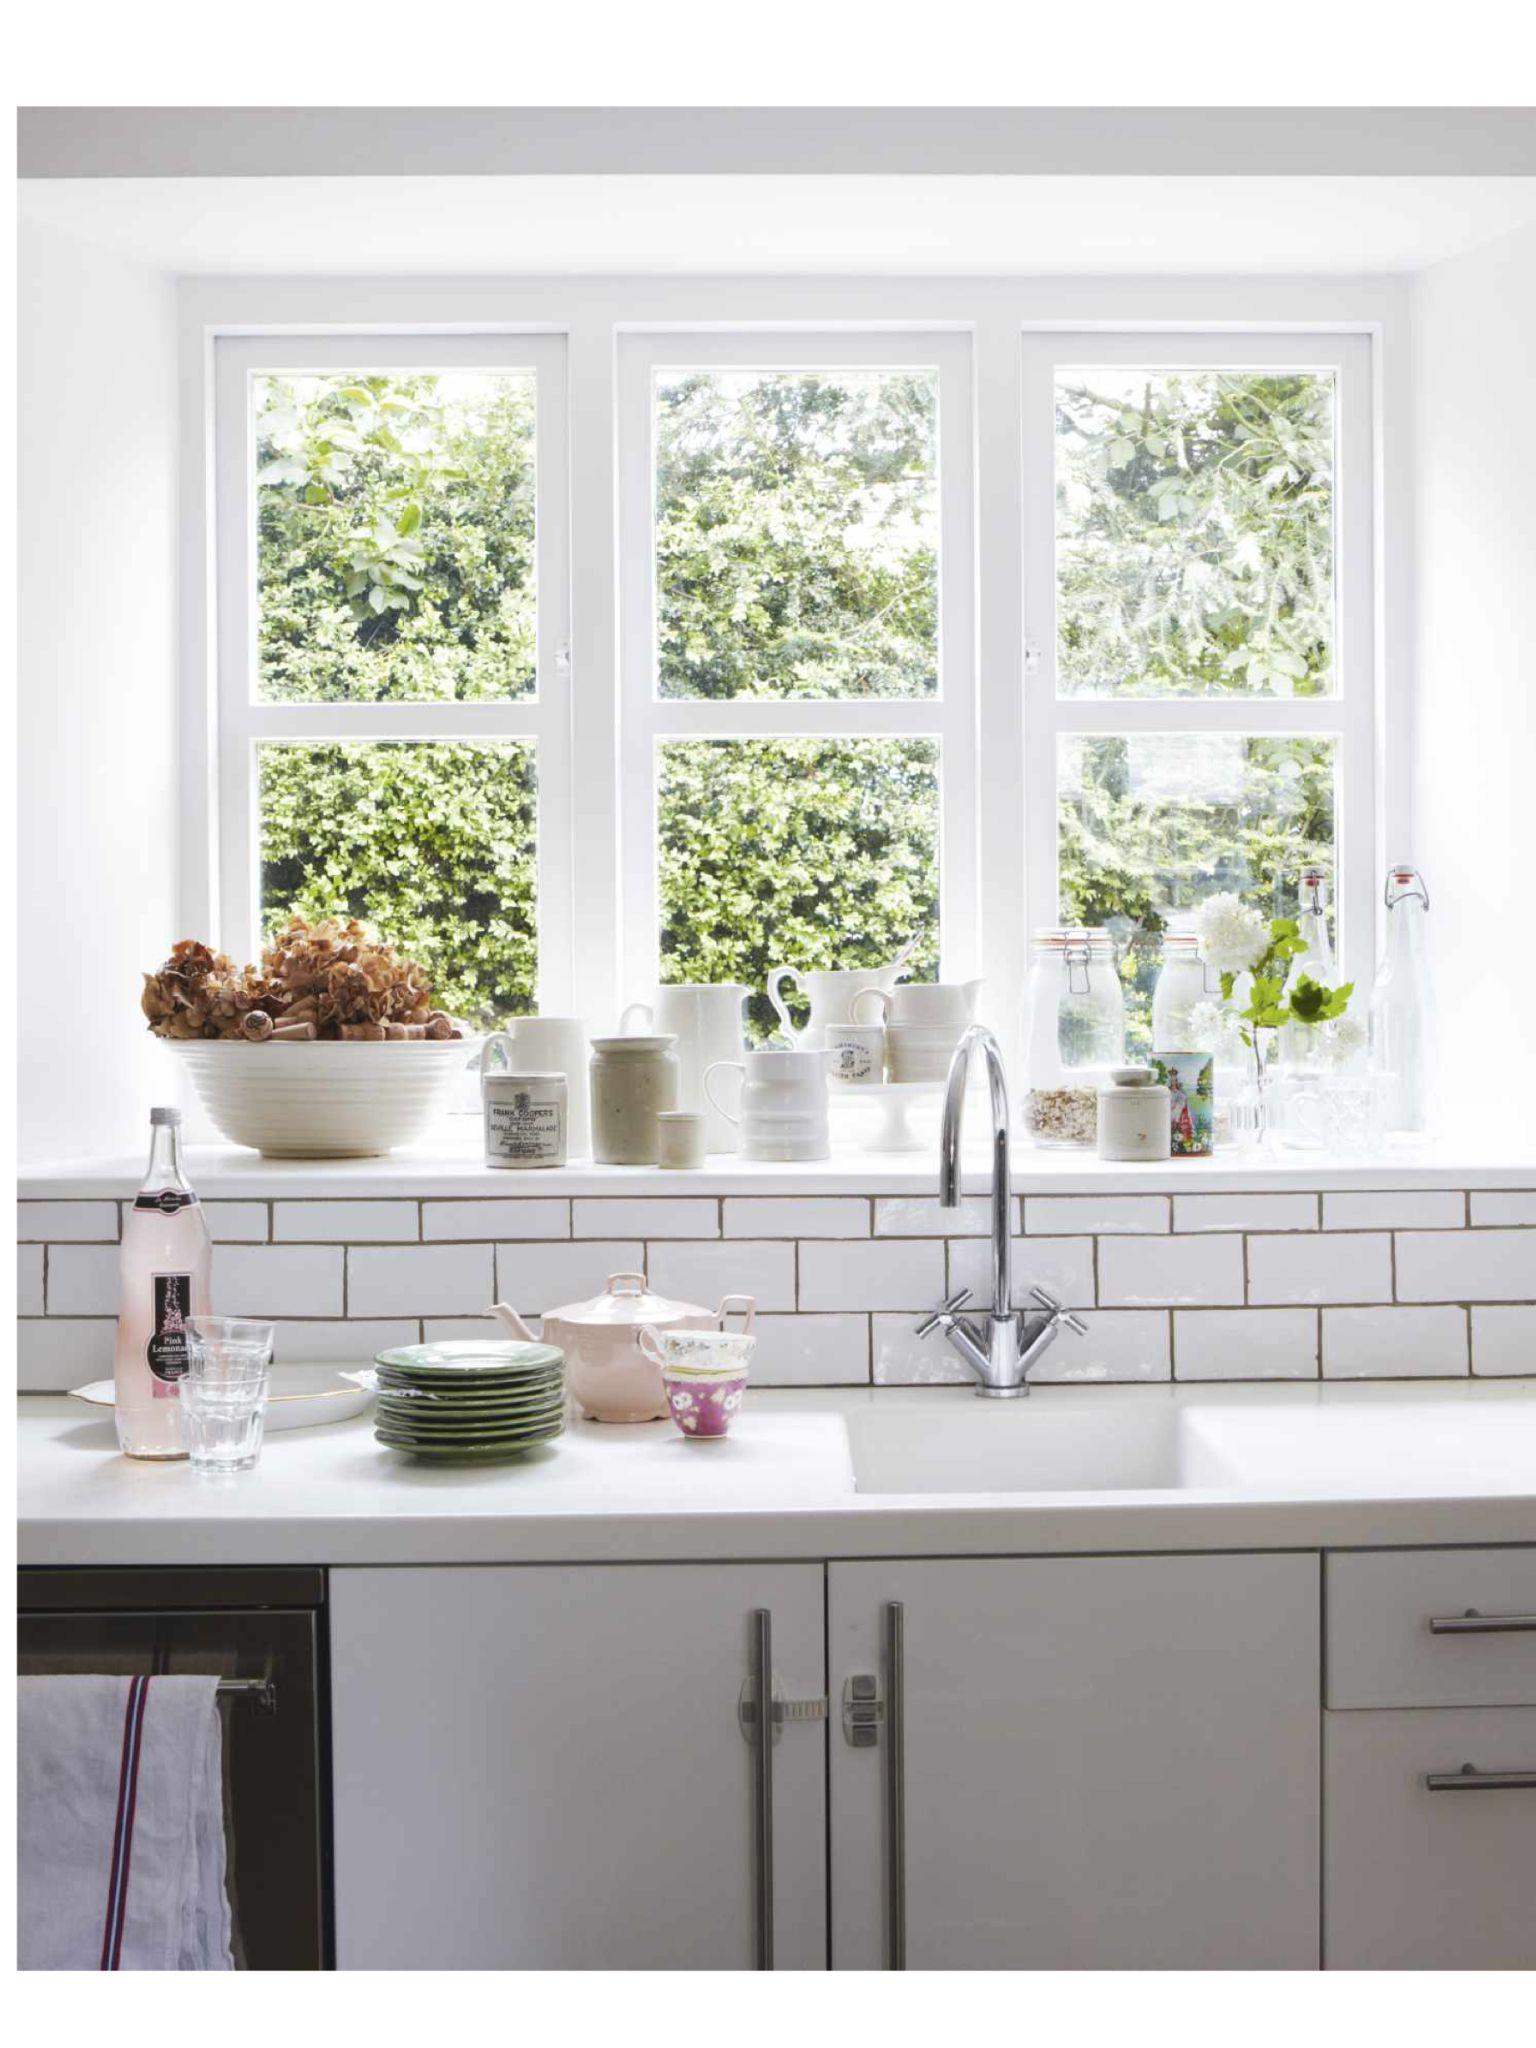 window behind kitchen sink brought to you by lg studio kitchen interior home kitchens on kitchen interior with window id=82357